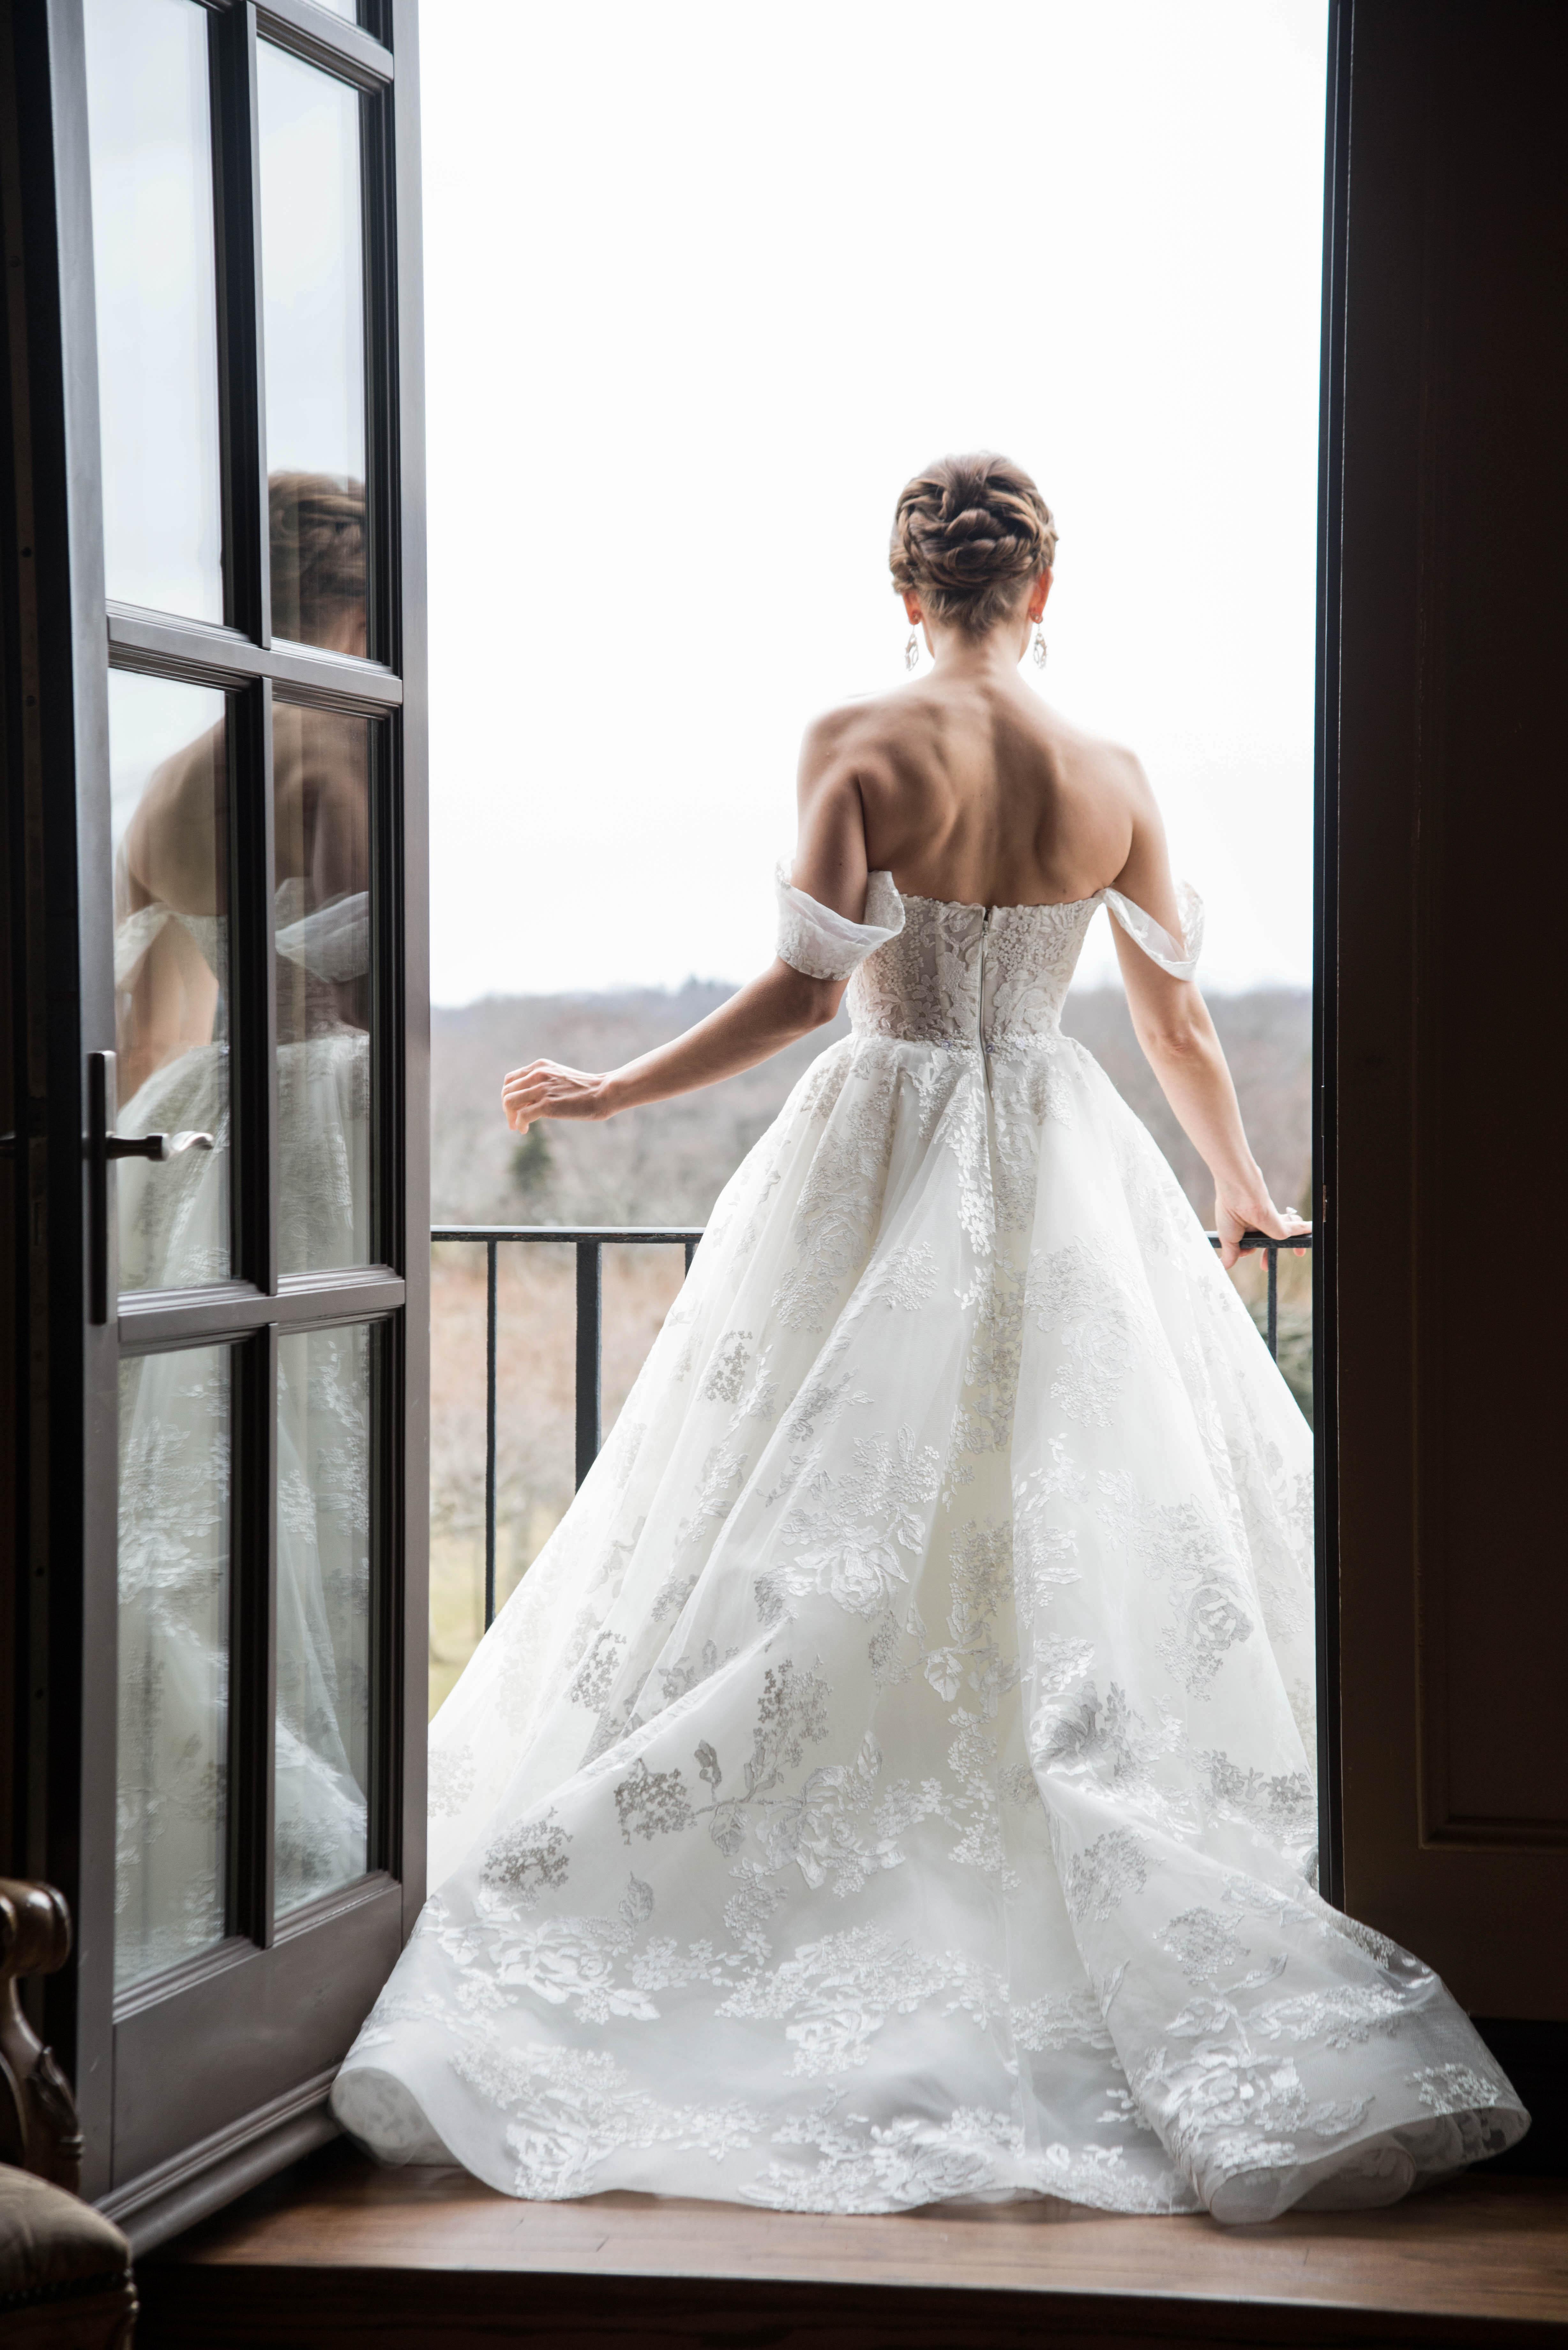 Jedediah Bila\'s Winter Wedding Album: Exclusive Details